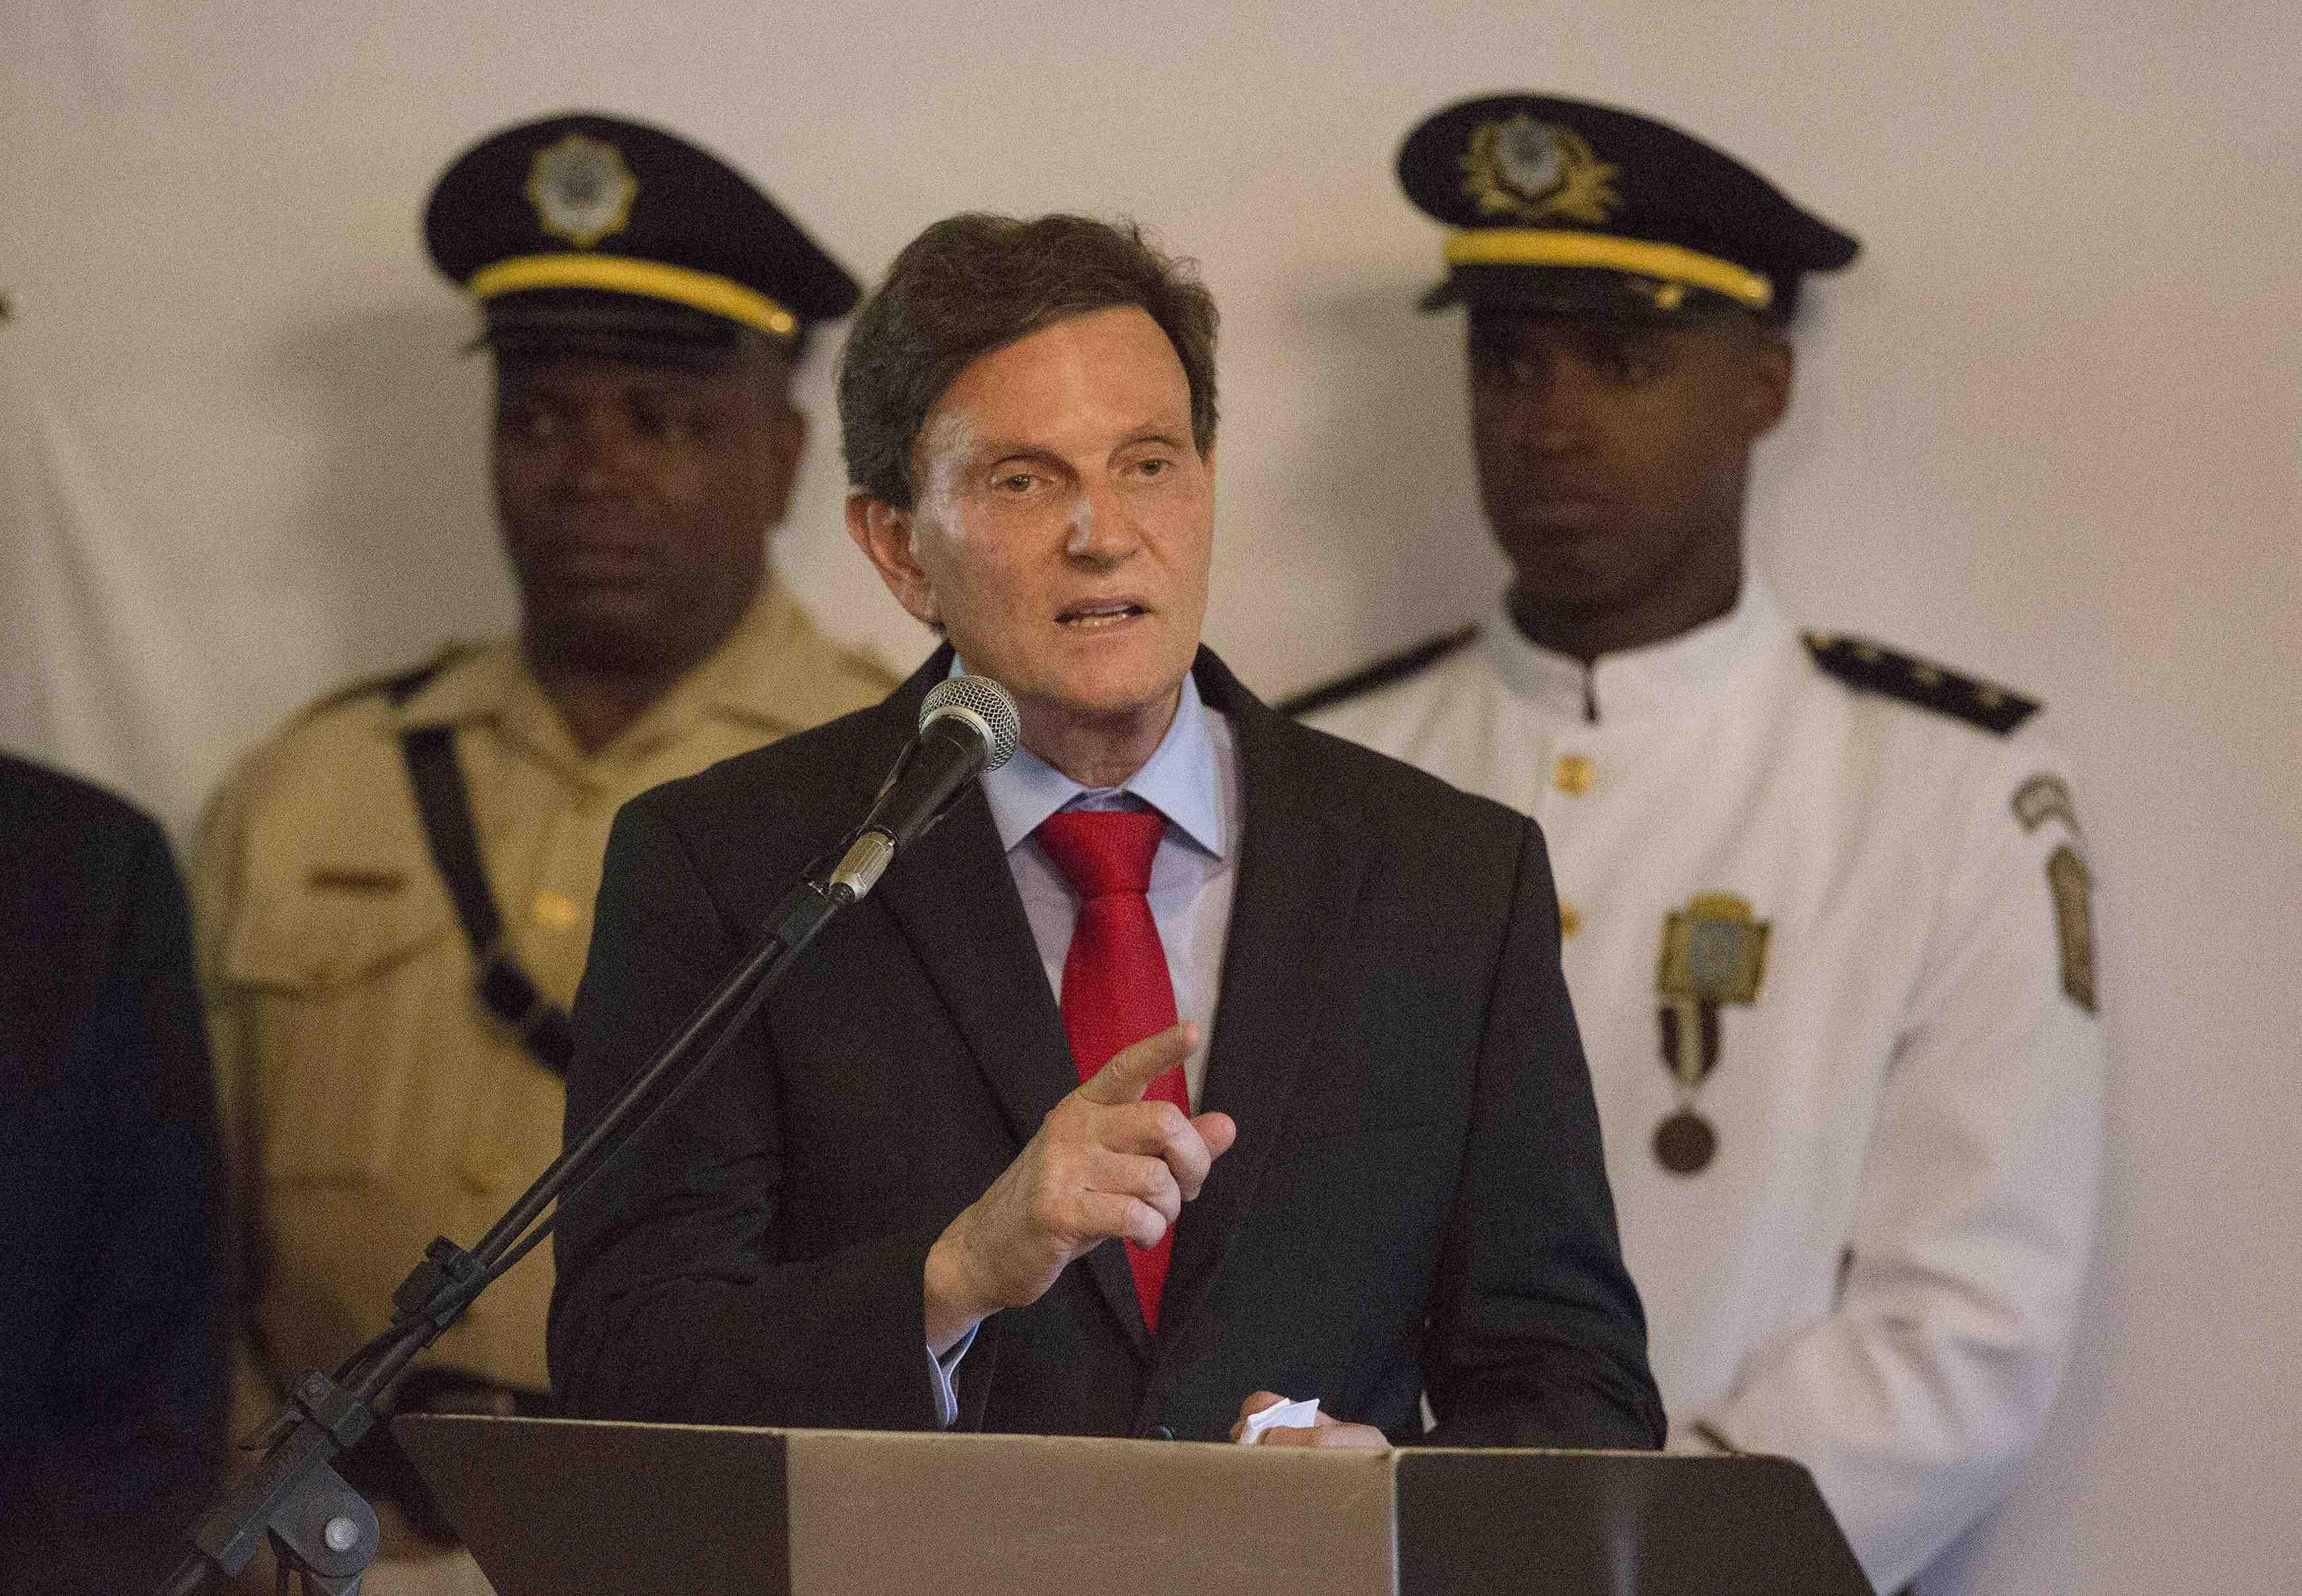 Marcelo Crivella, prefeito do Rio de Janeiro, discursando durante cerimônia.